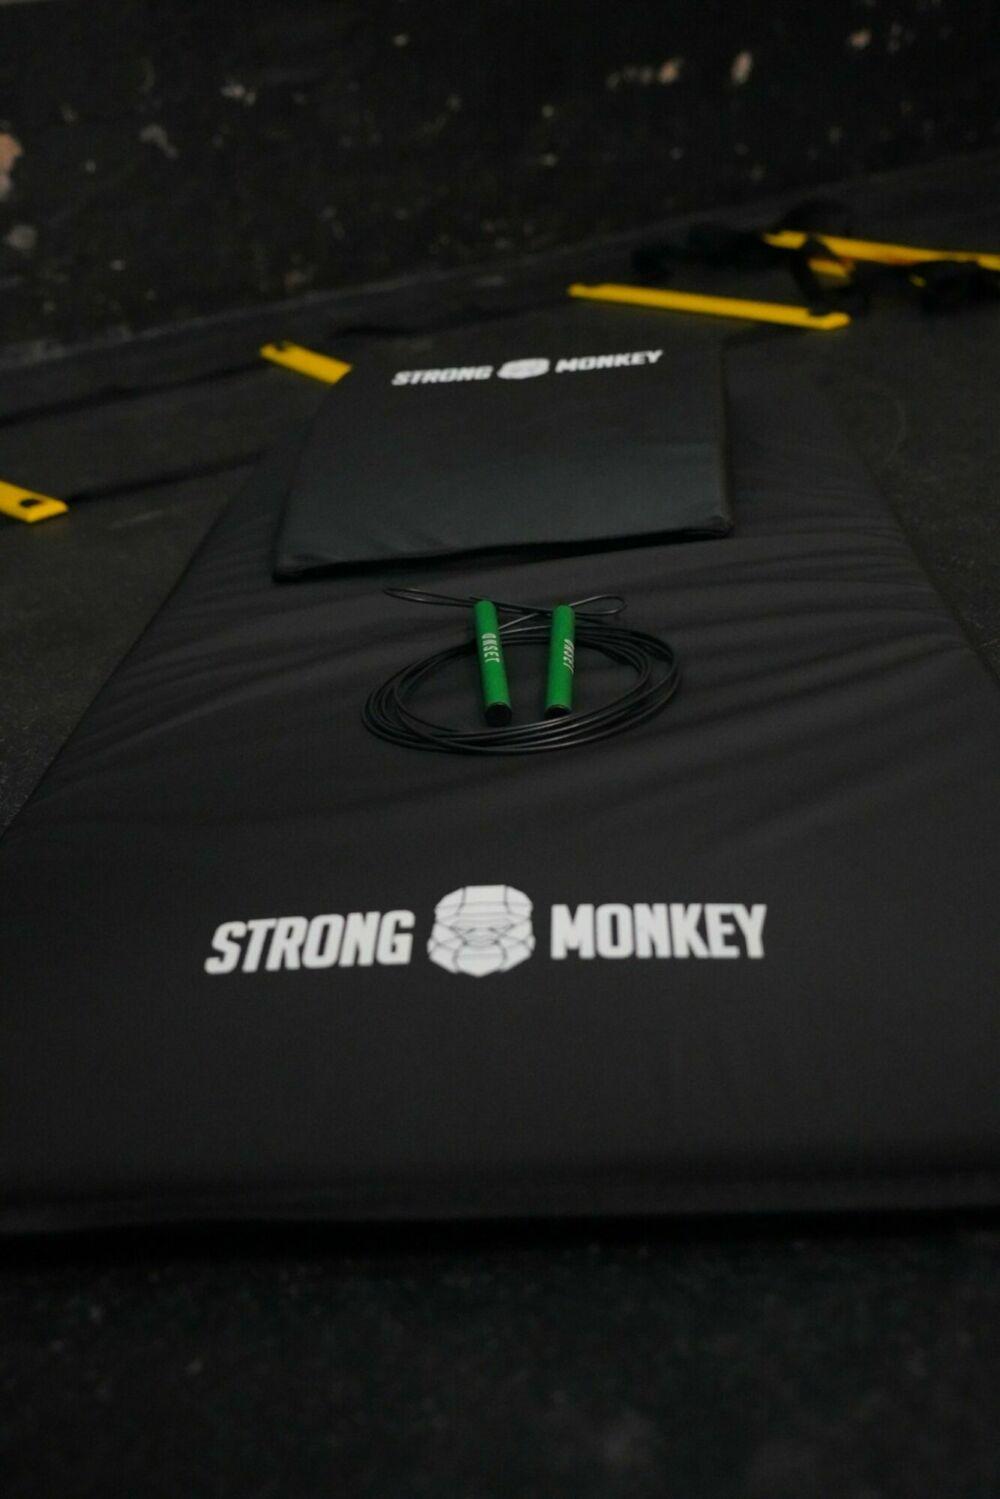 equipamentos strongmonkey com corda